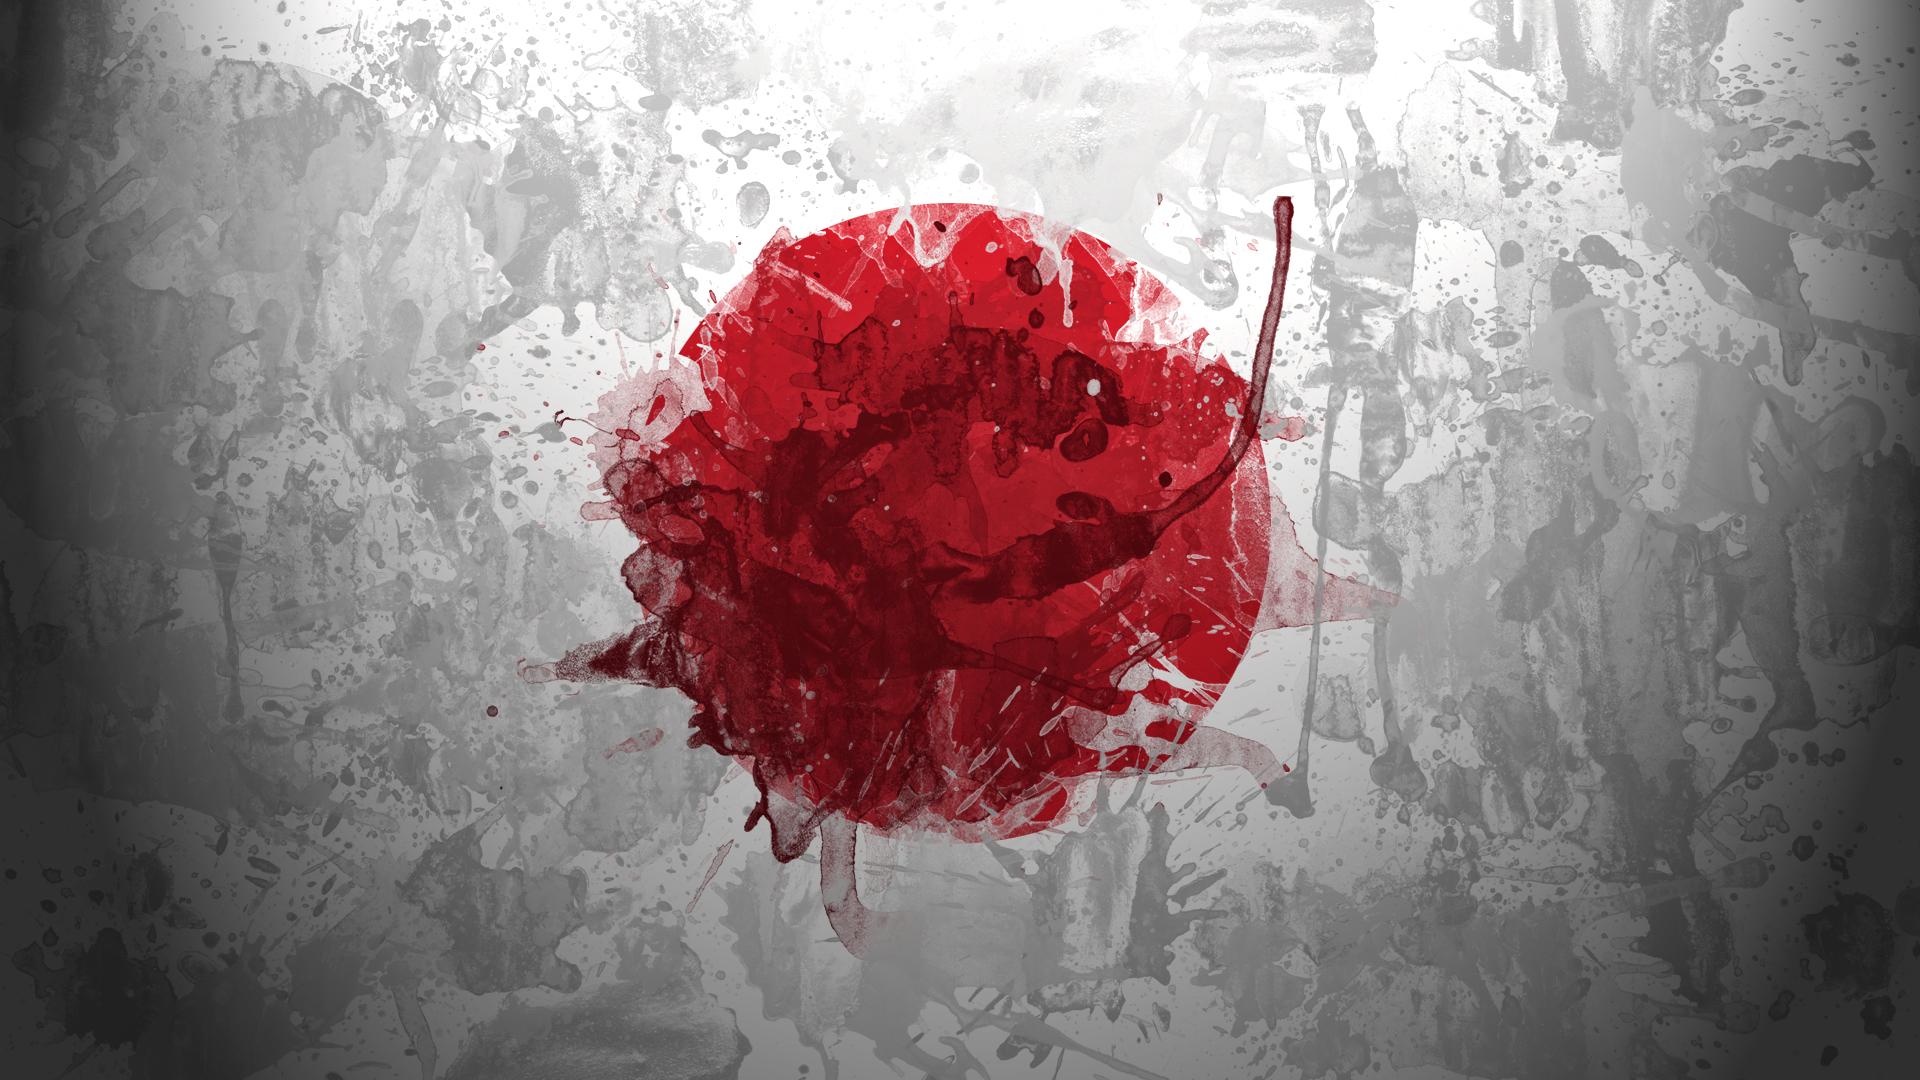 Japan Flag Art 2013 Wallpaper | High Quality Wallpapers,Wallpaper ...